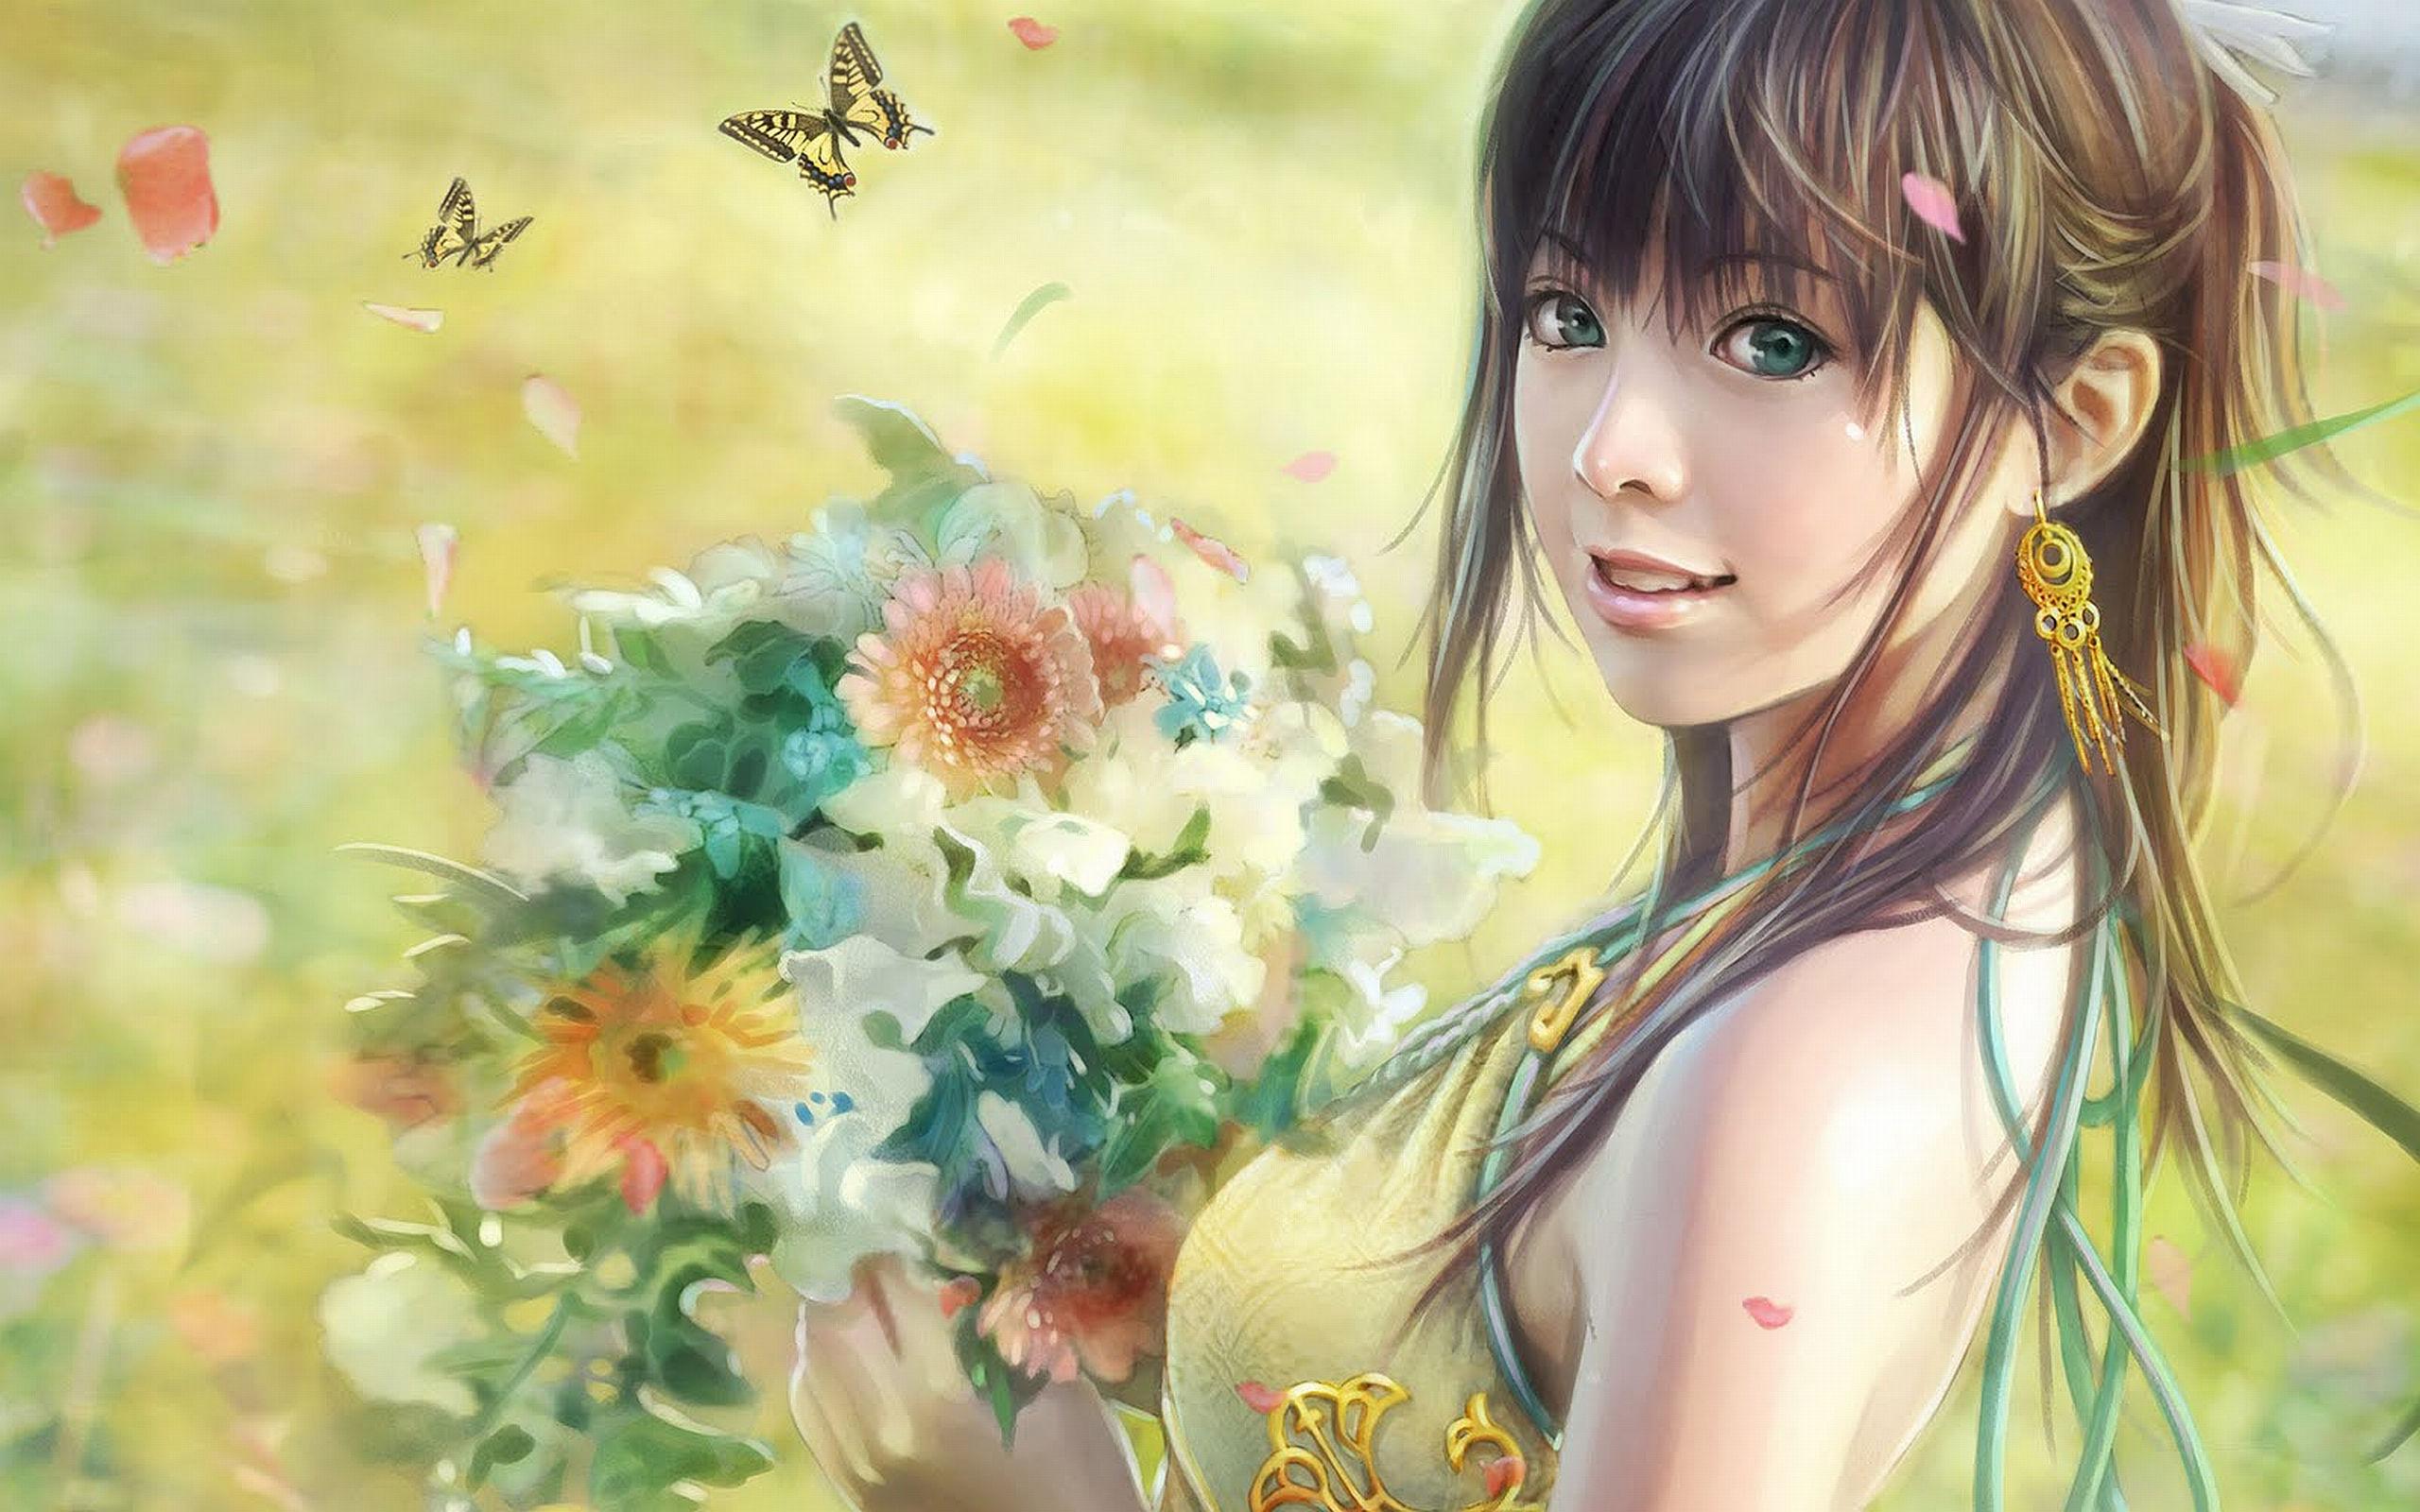 Género Fantástico - Mujeres  - Género Fantástico - Hot - Girl - Luz - Gorgeous - Field - Verde - Flores - Bouquet - Floral - Woman Fondo de Pantalla